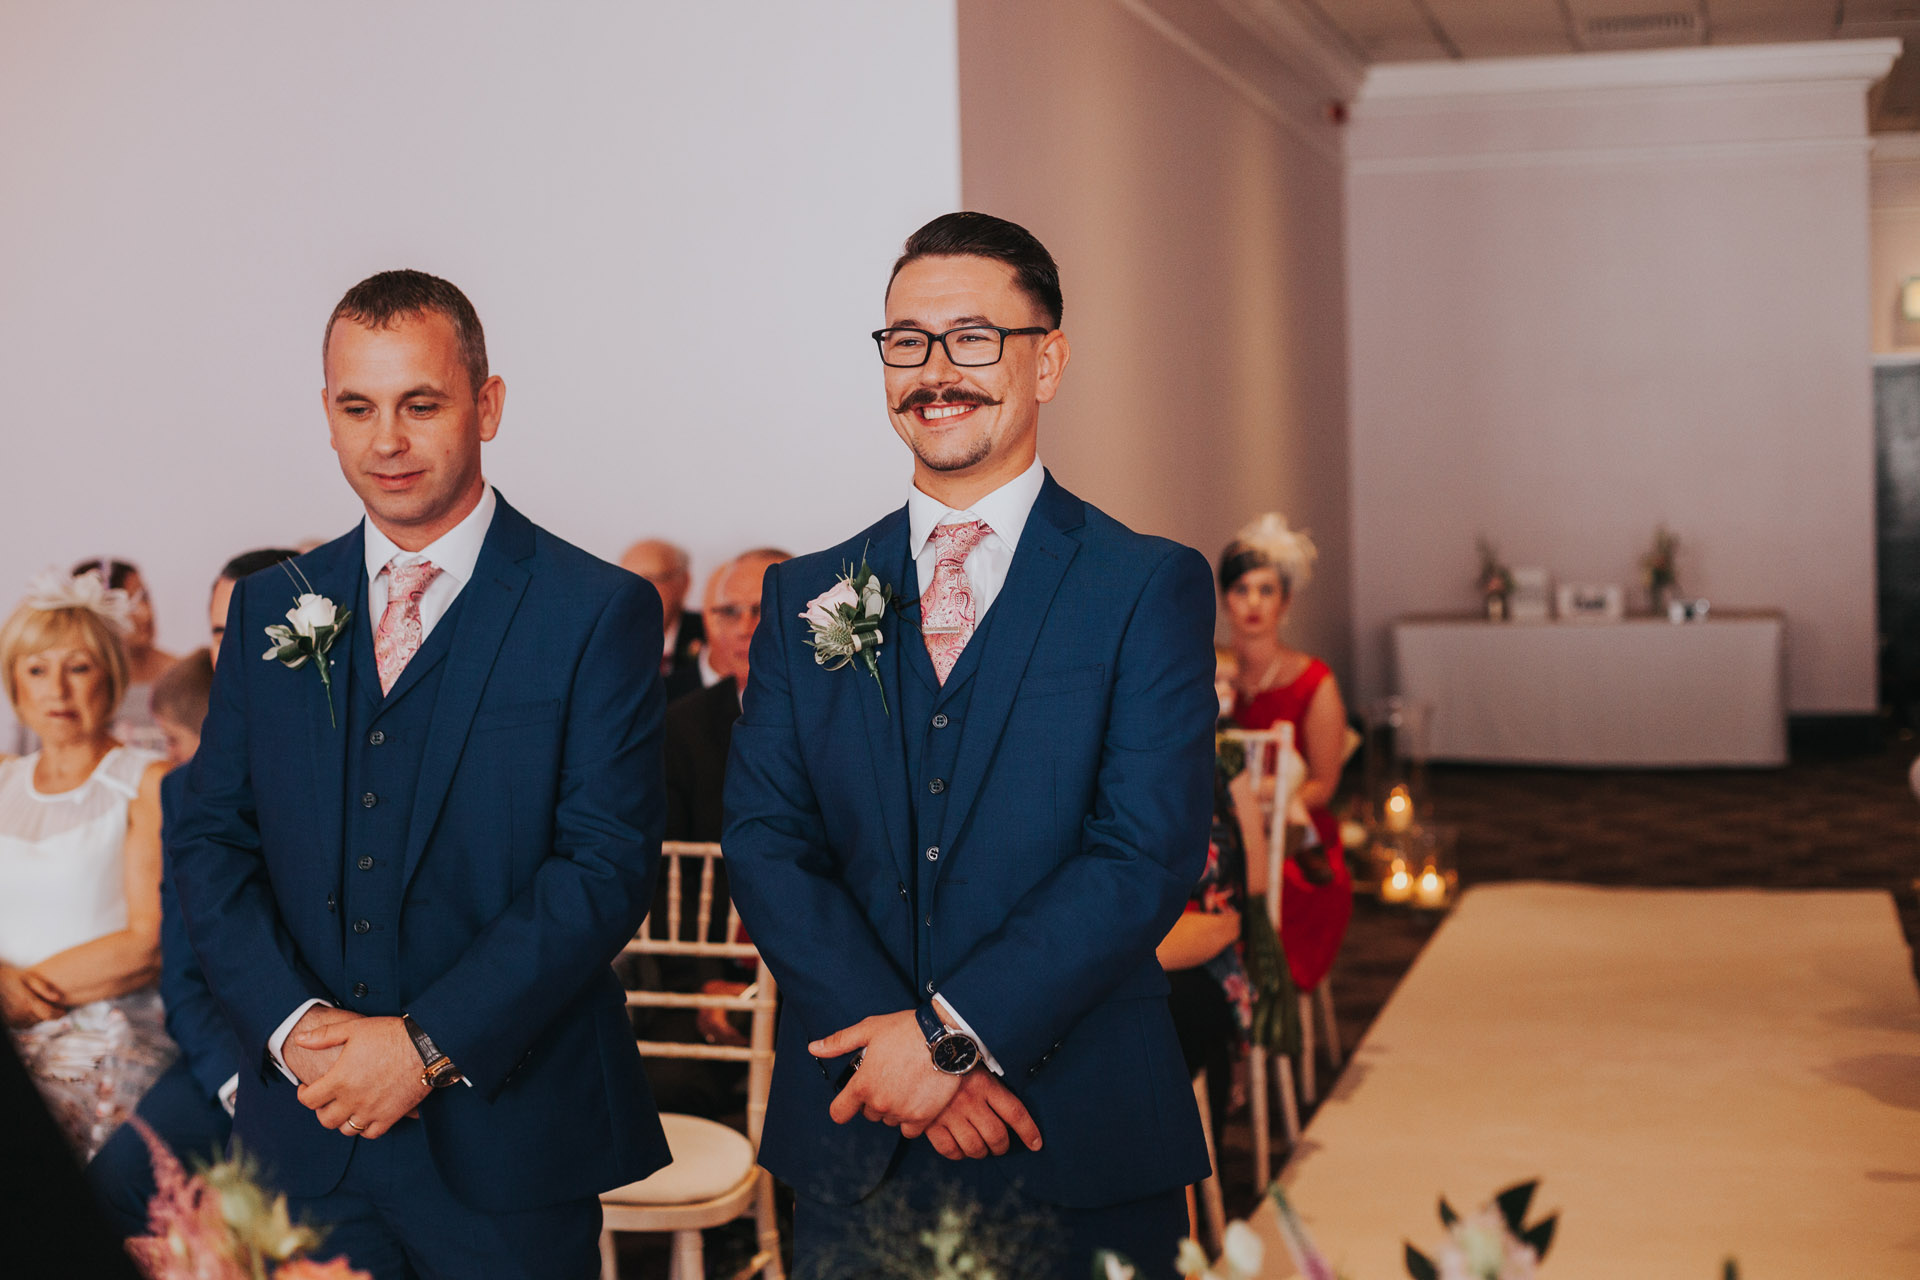 Groom awaits bride smiling.